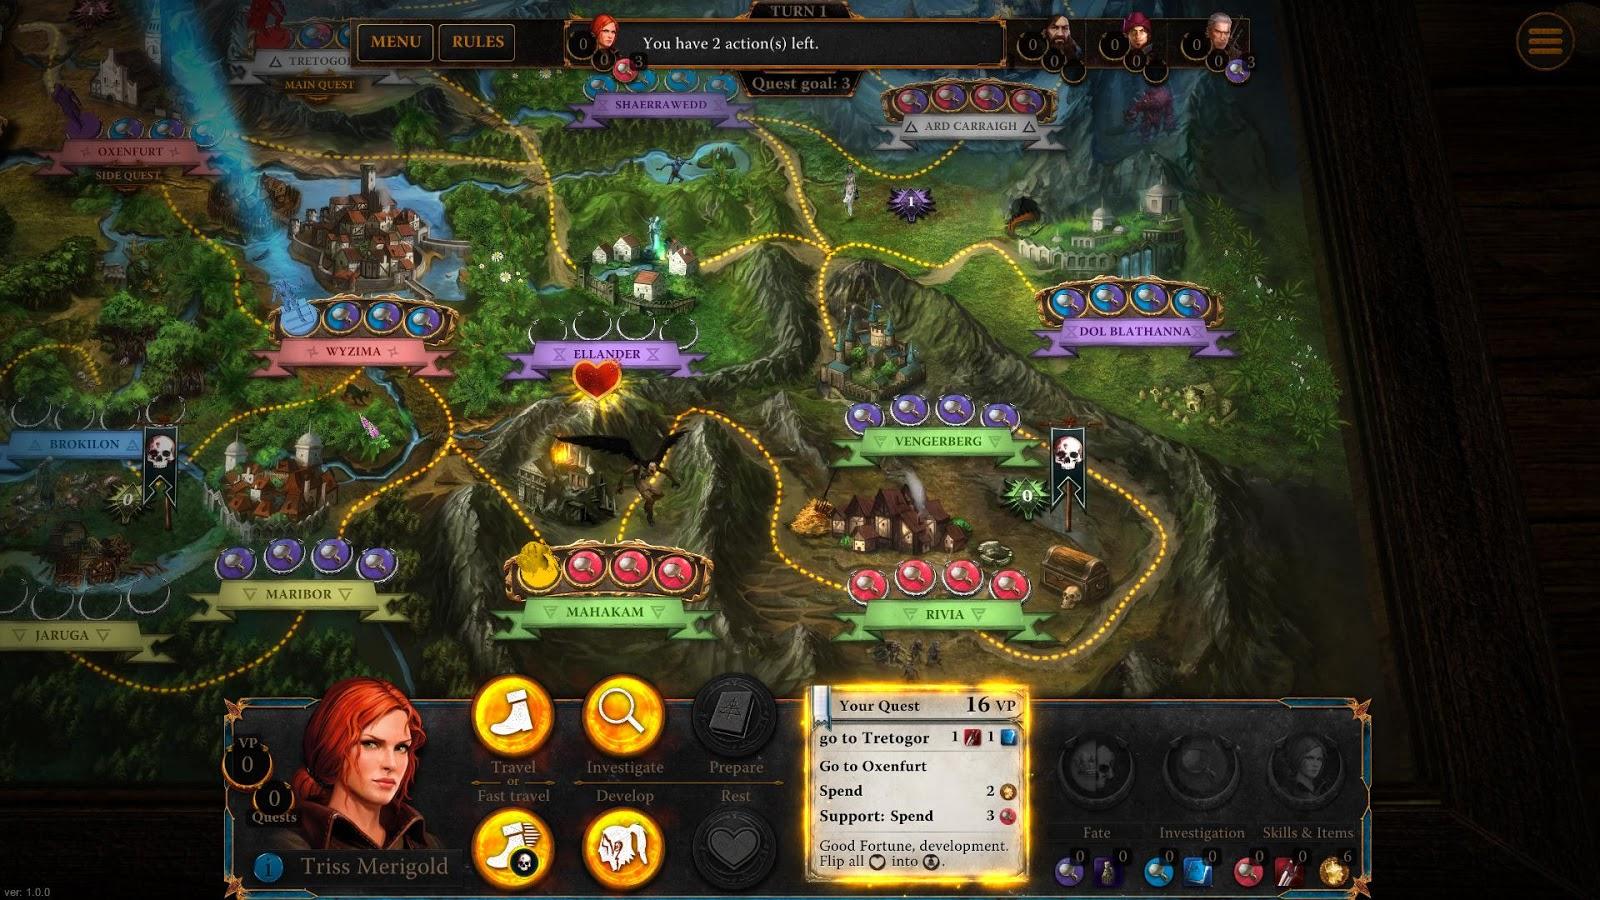 witcher_adventure_game_screenshot_gog_03